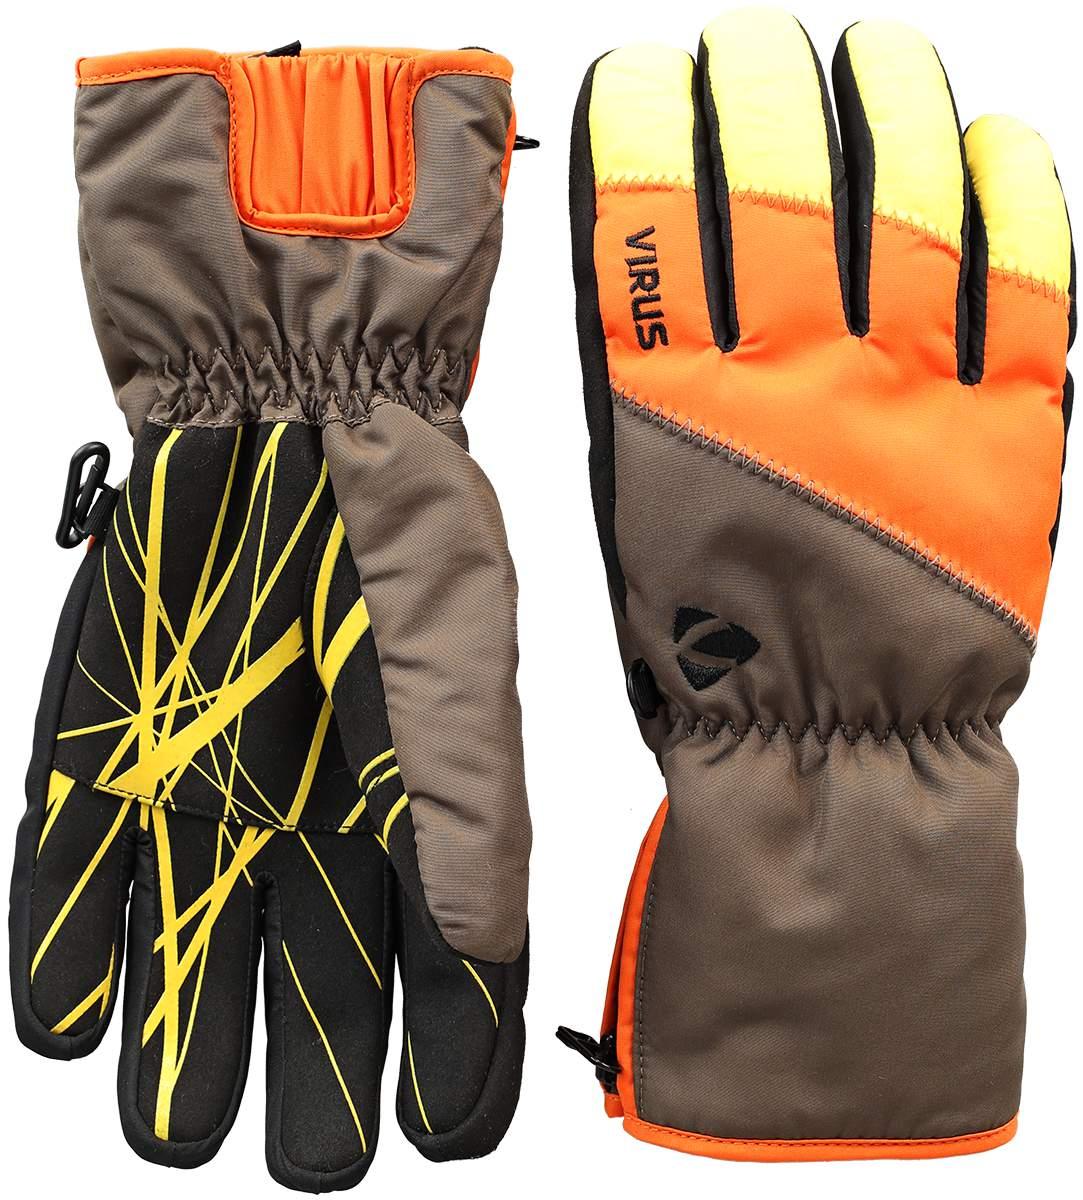 Перчатки Trail W женскиеПерчатки<br><br><br>Цвет: Апельсиновый<br>Размер: L